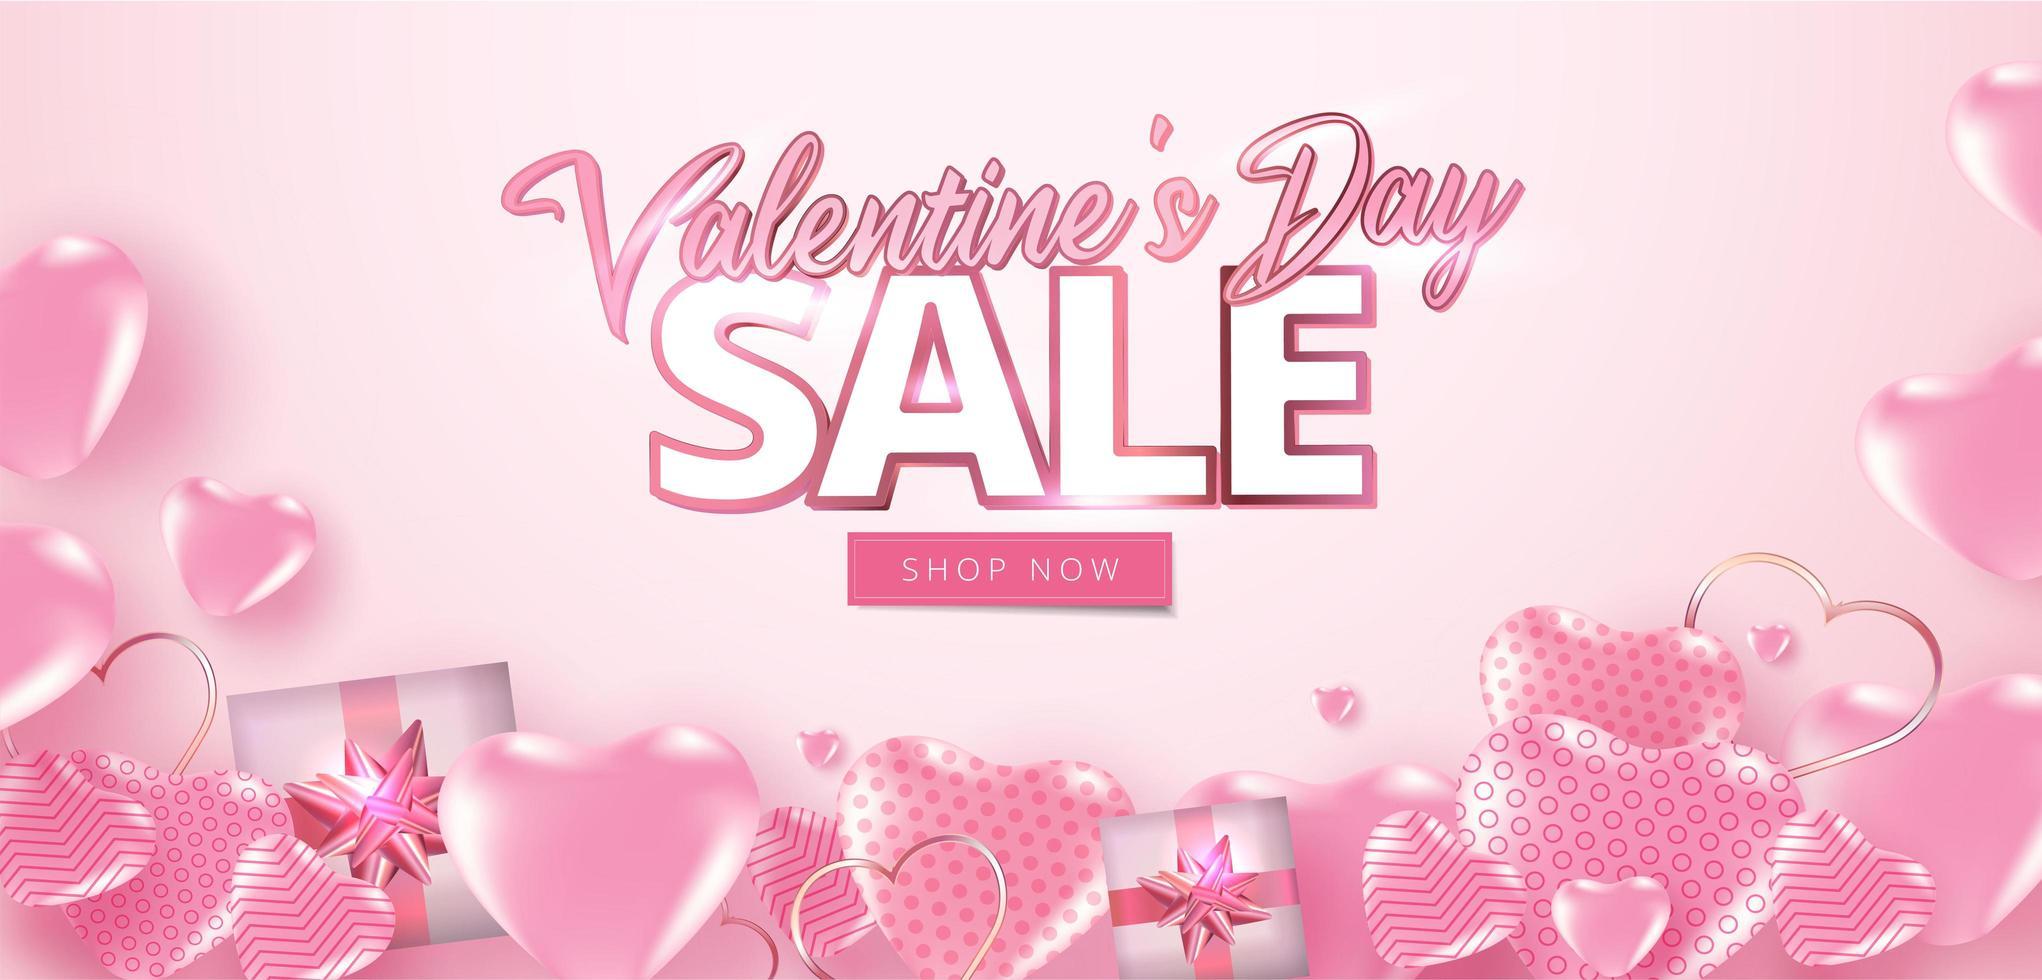 pôster ou banner de venda do dia dos namorados vetor